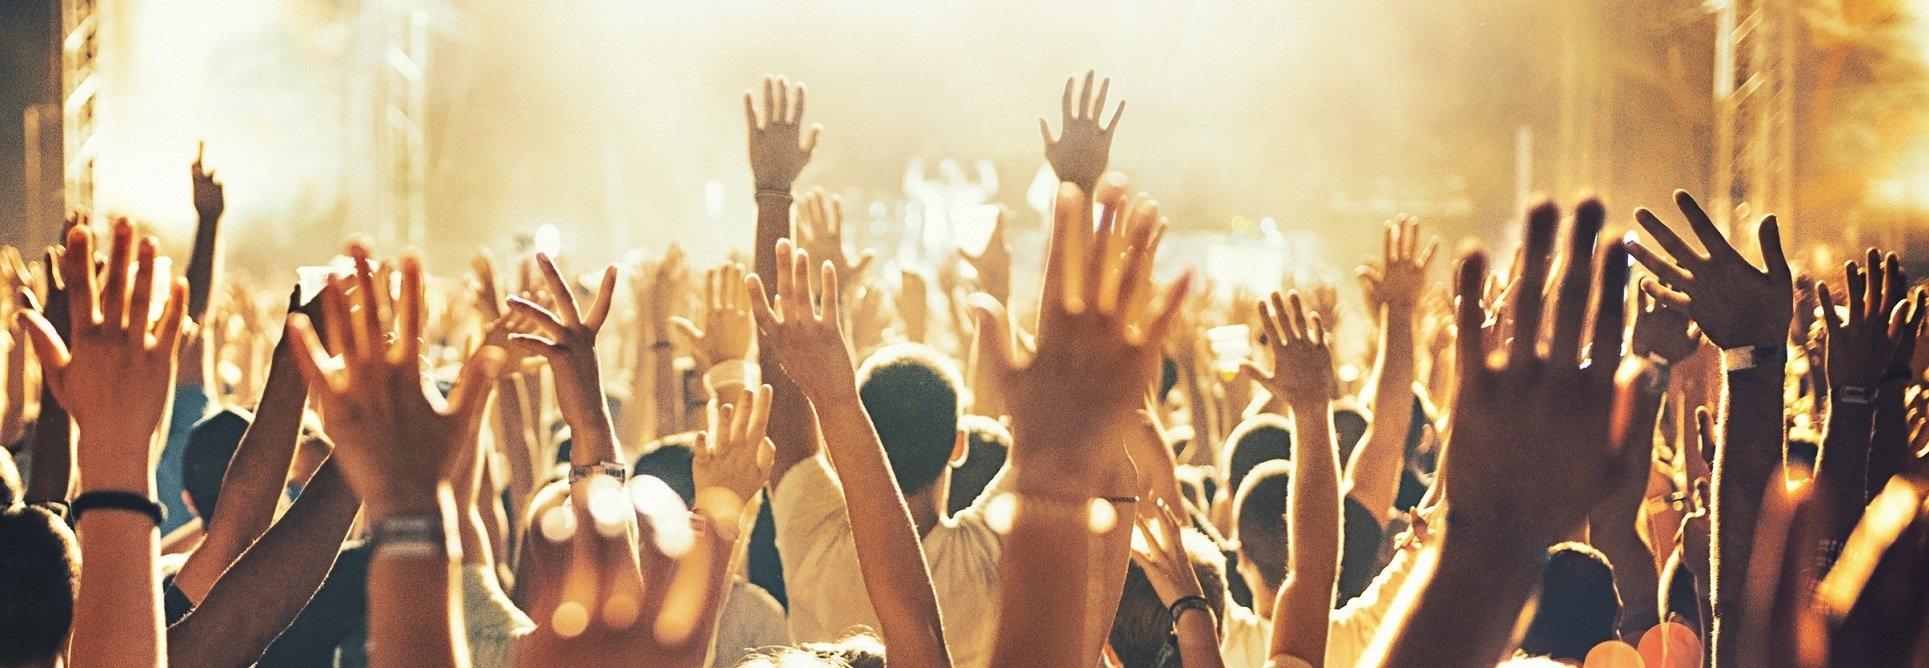 crowd hands-739852-edited